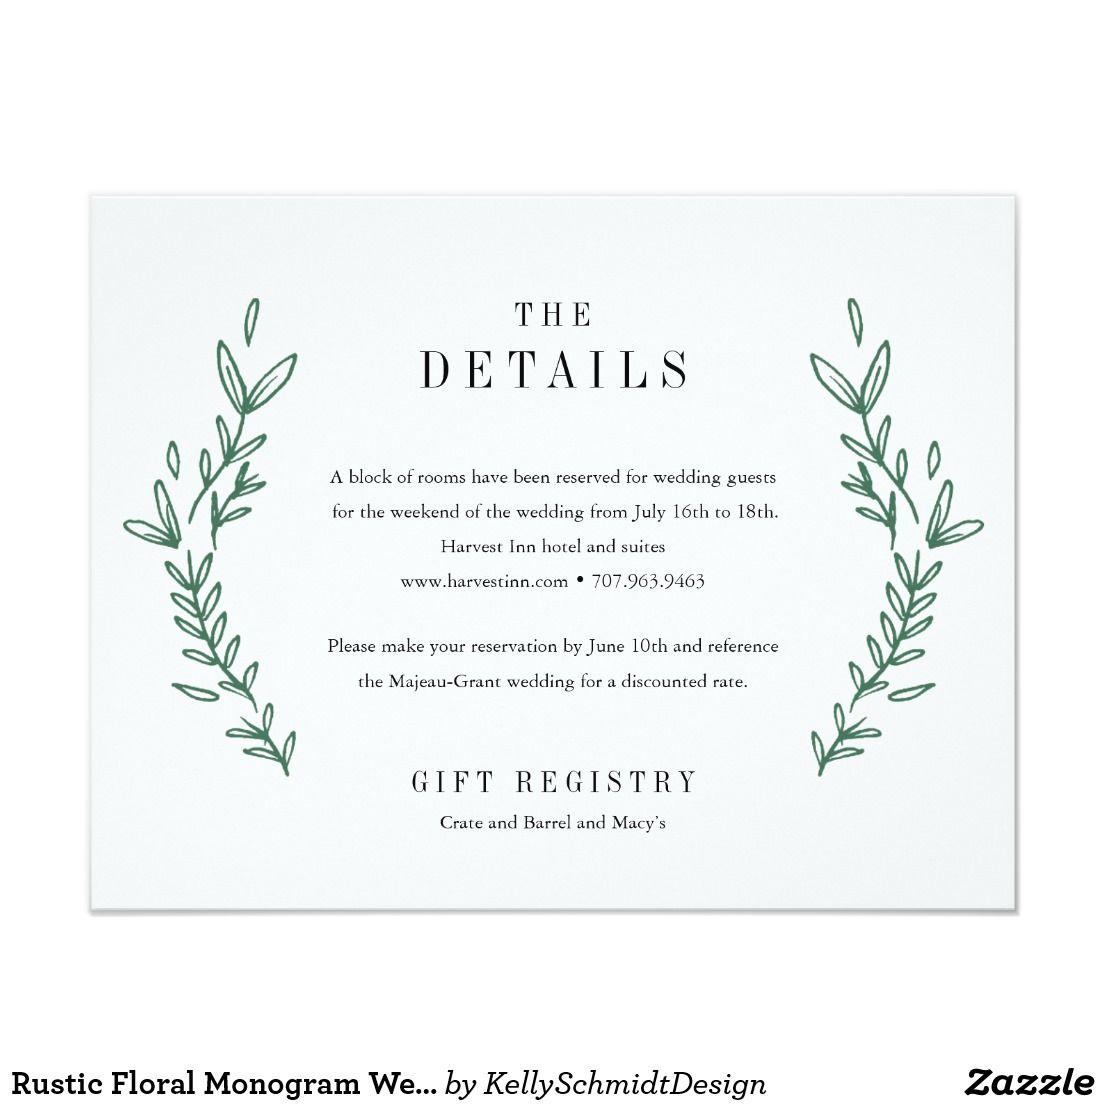 Rustic Floral Monogram Wedding Details Card Favors Wedding And